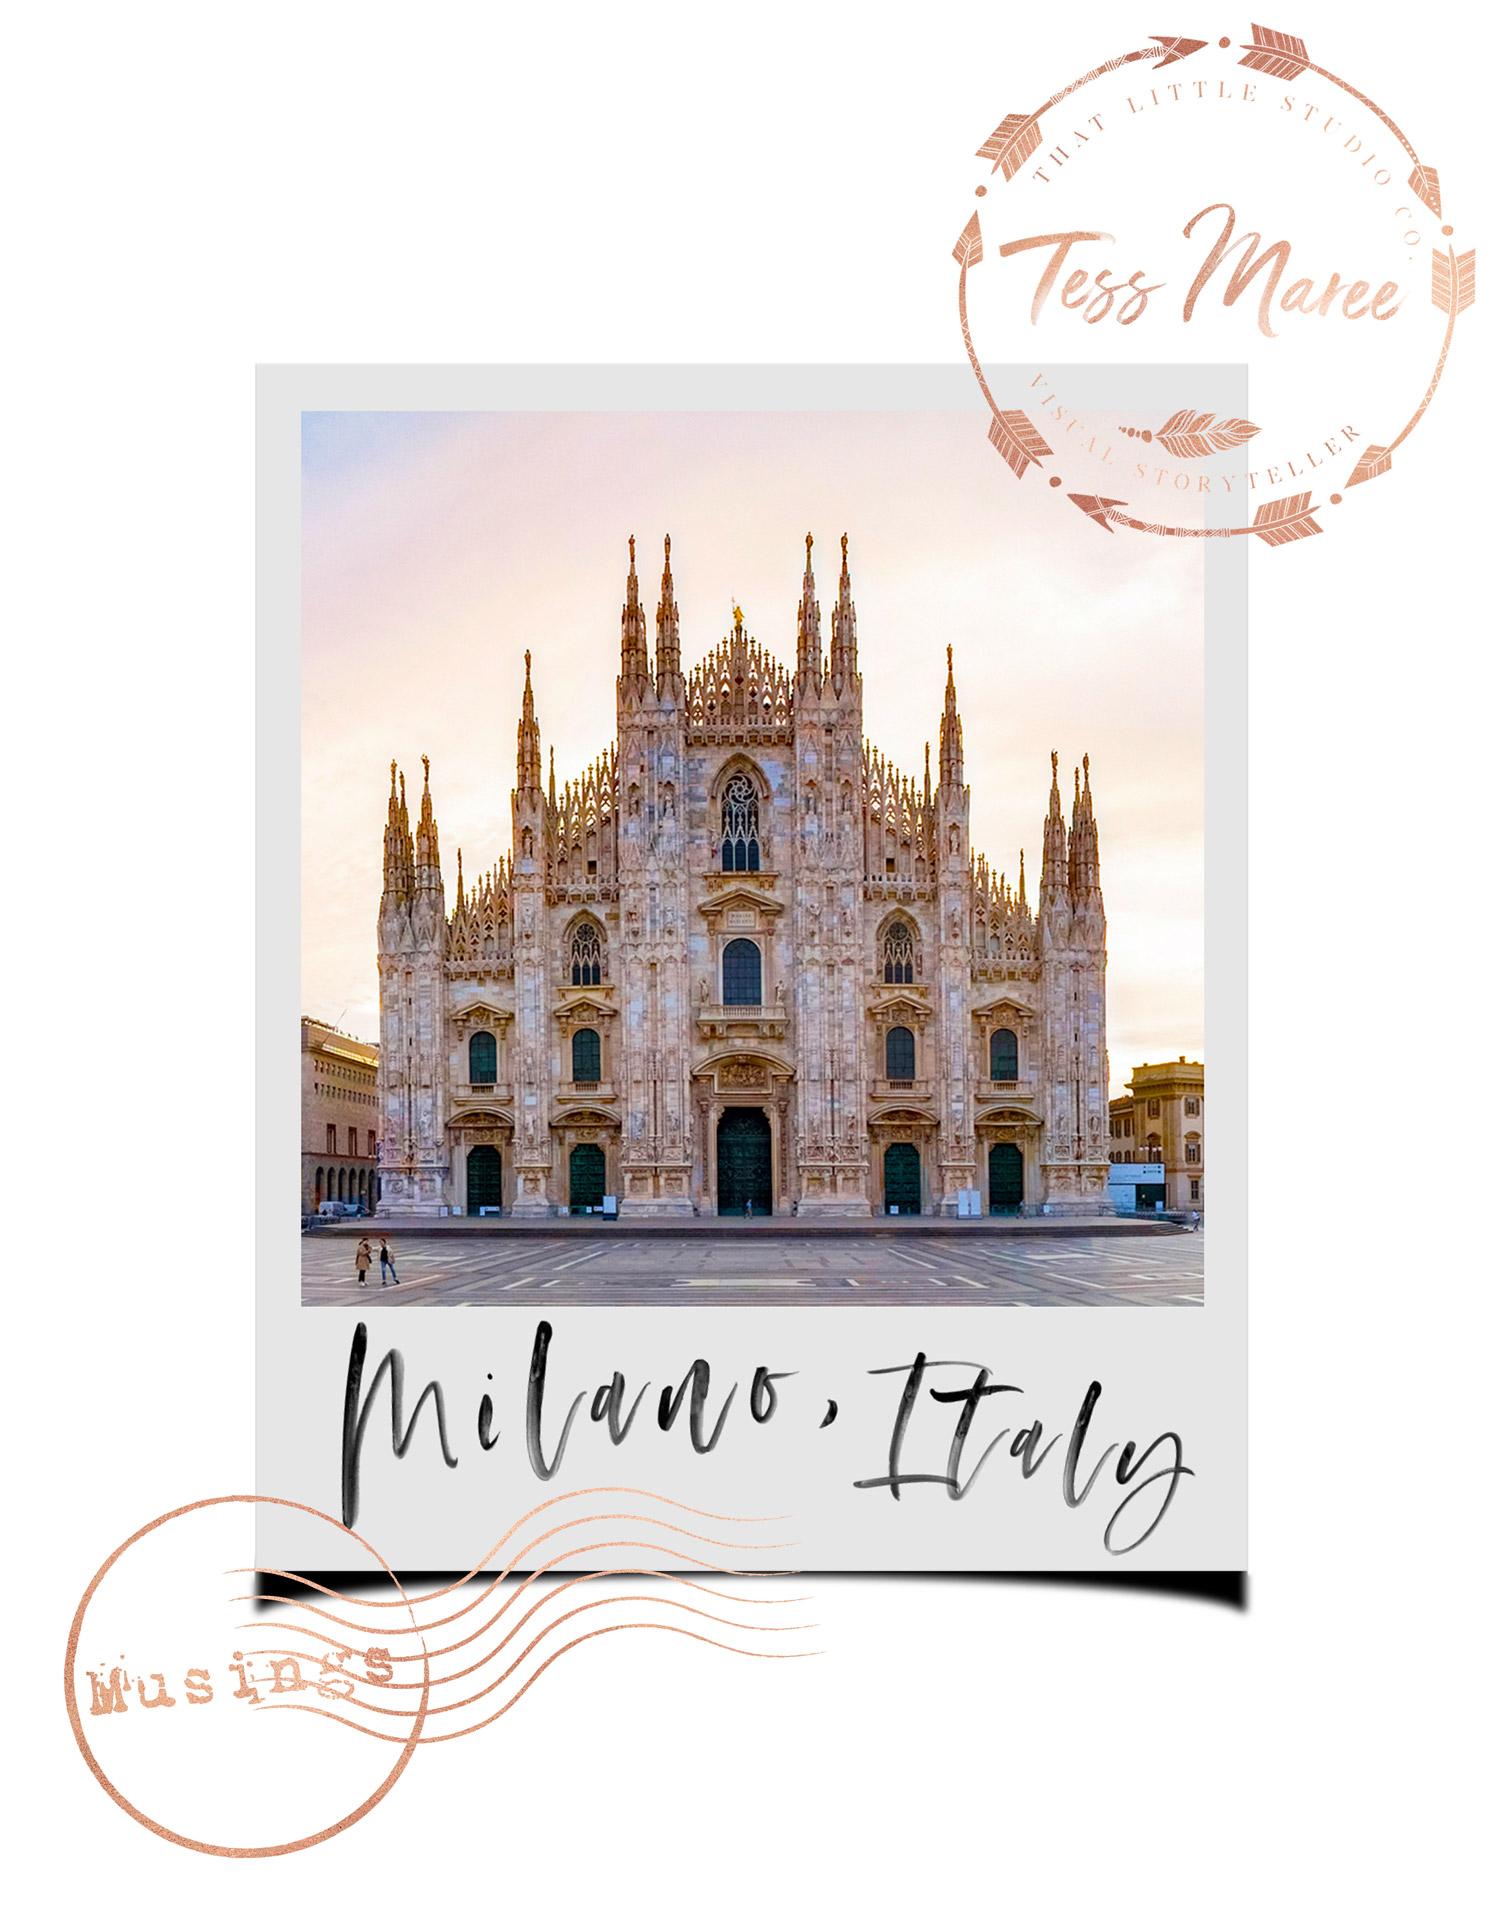 Tess-Maree-Musing-The-Duomo-Milano-Italy-Polaroid